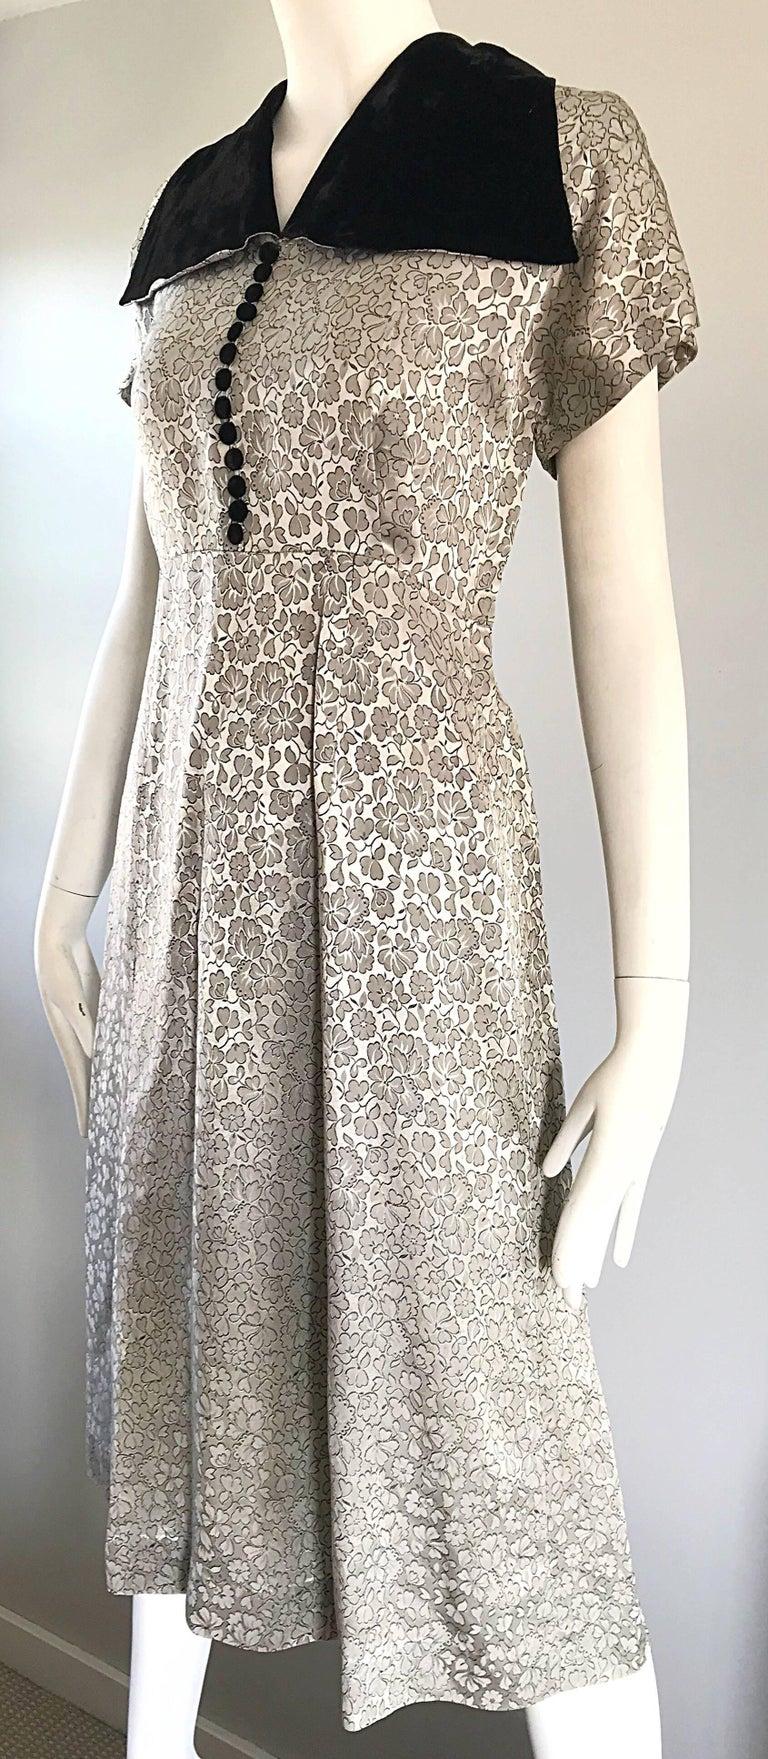 1940s Dress Silky Stars Vintage 40s Dress: Beautiful 1940 Silver Grey And Black Silk + Velvet Flower